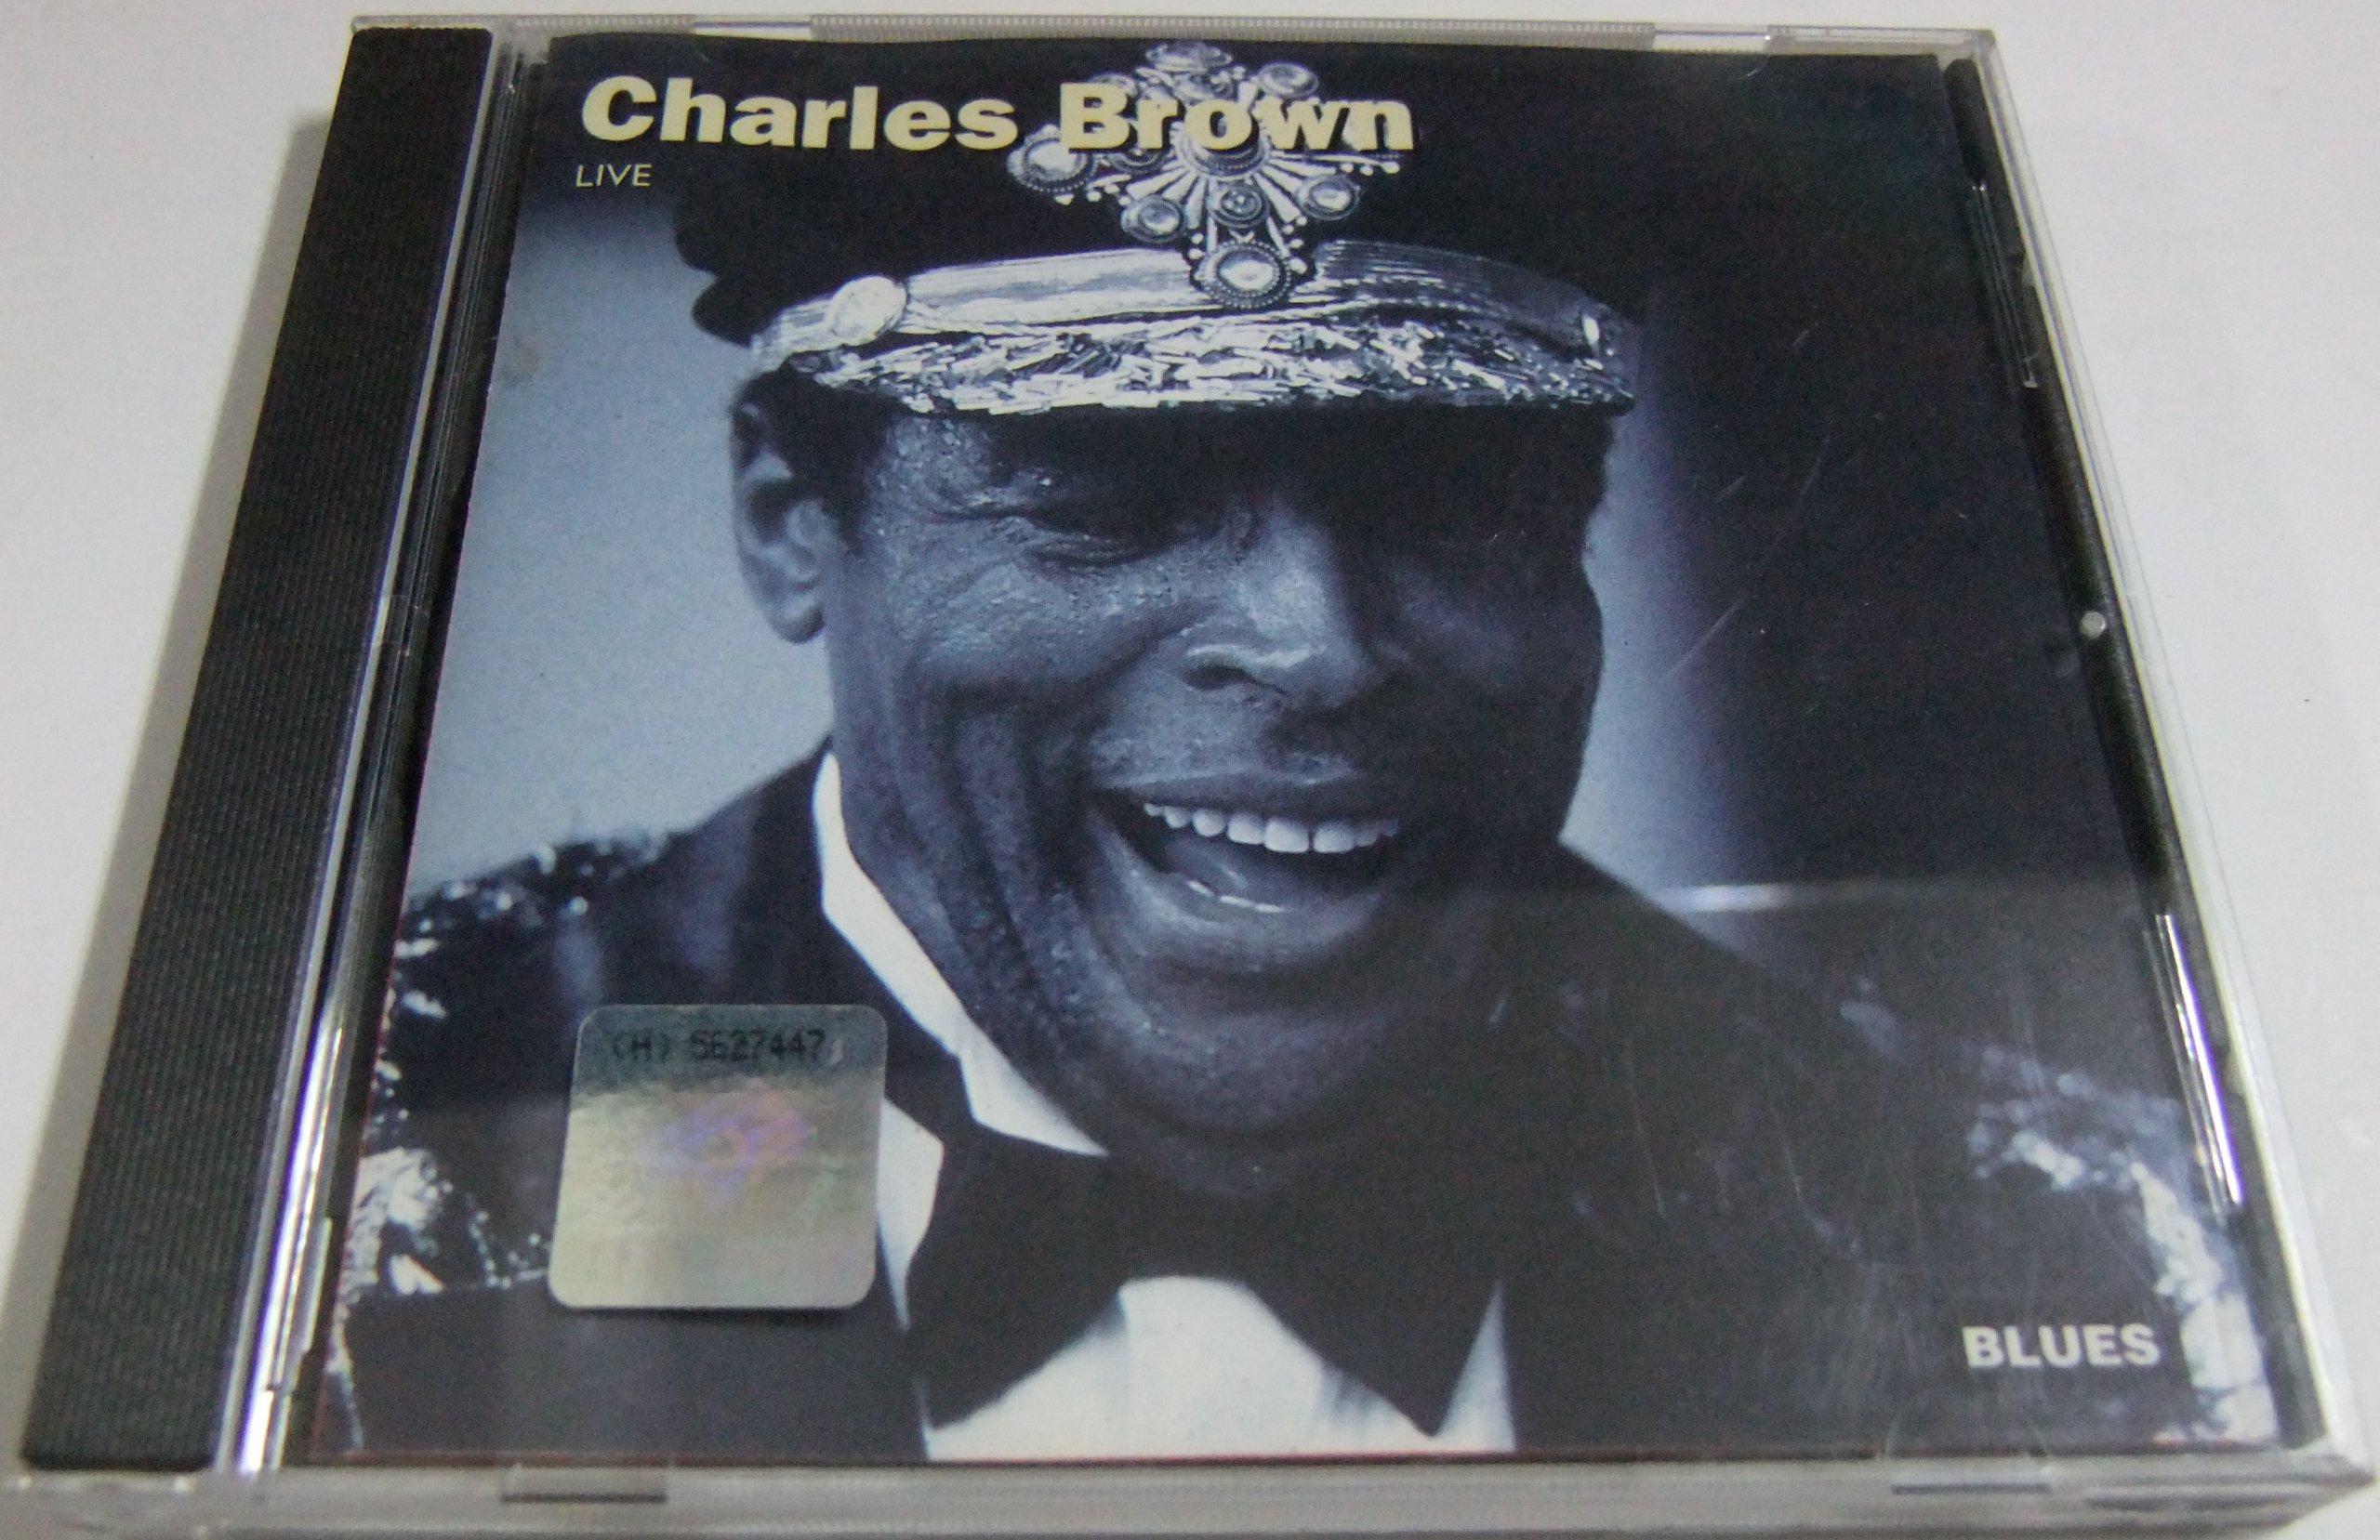 Charles Brown - Live H11